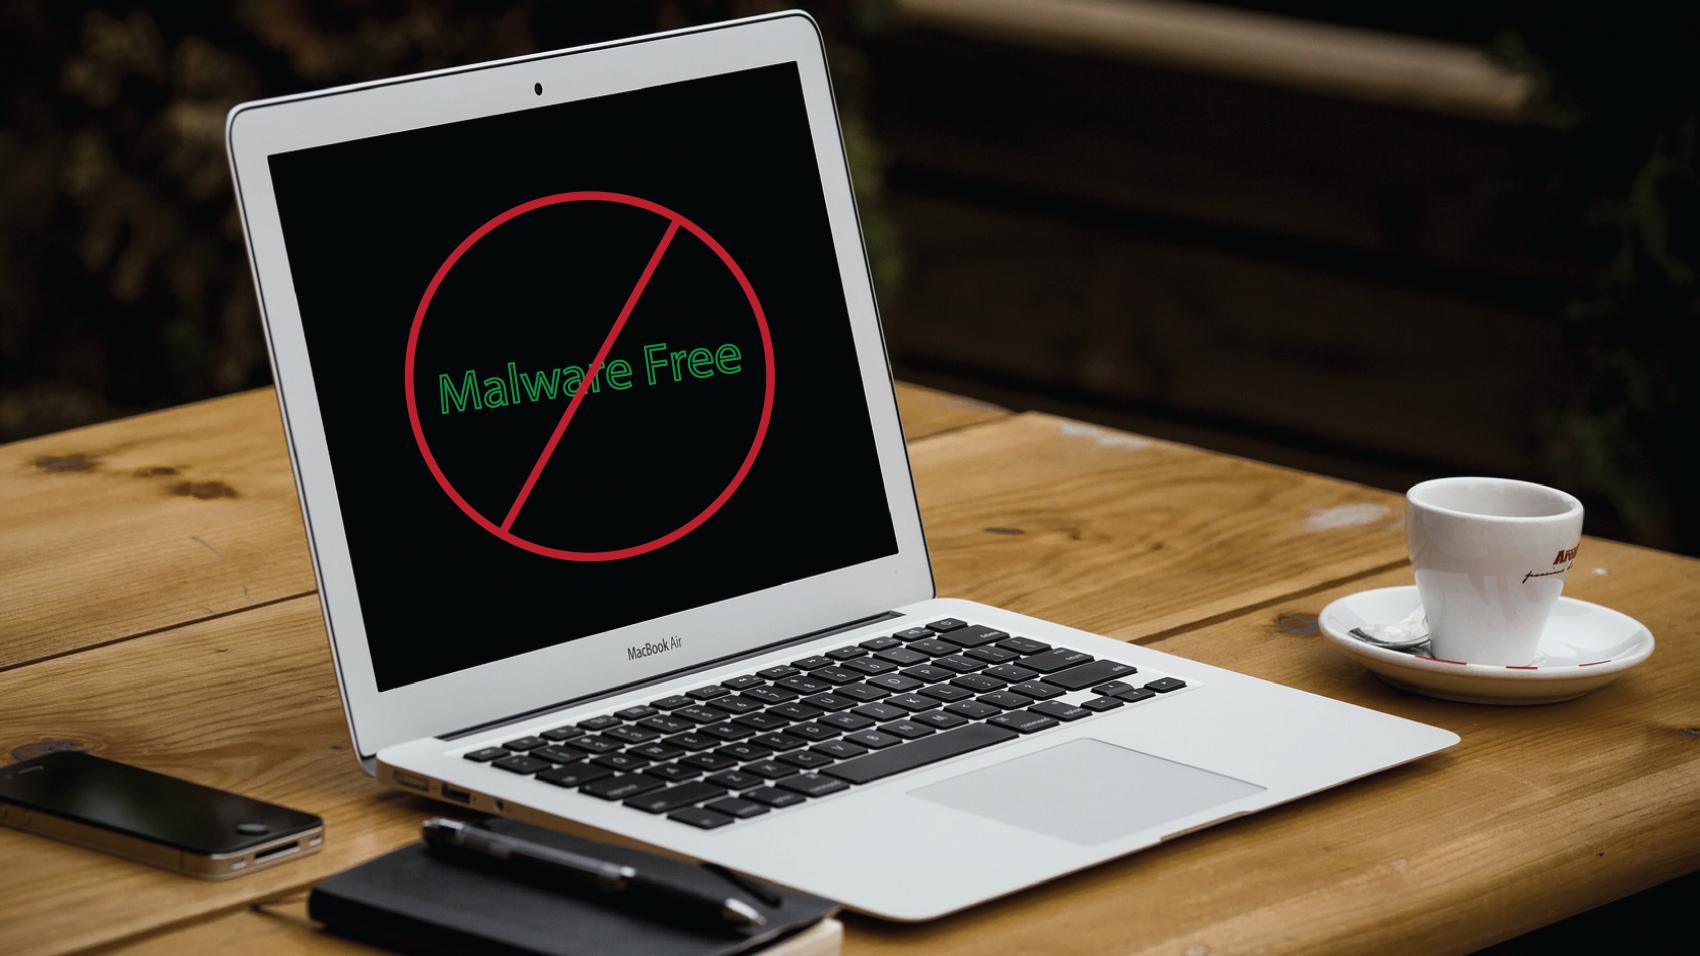 eliminate free malware